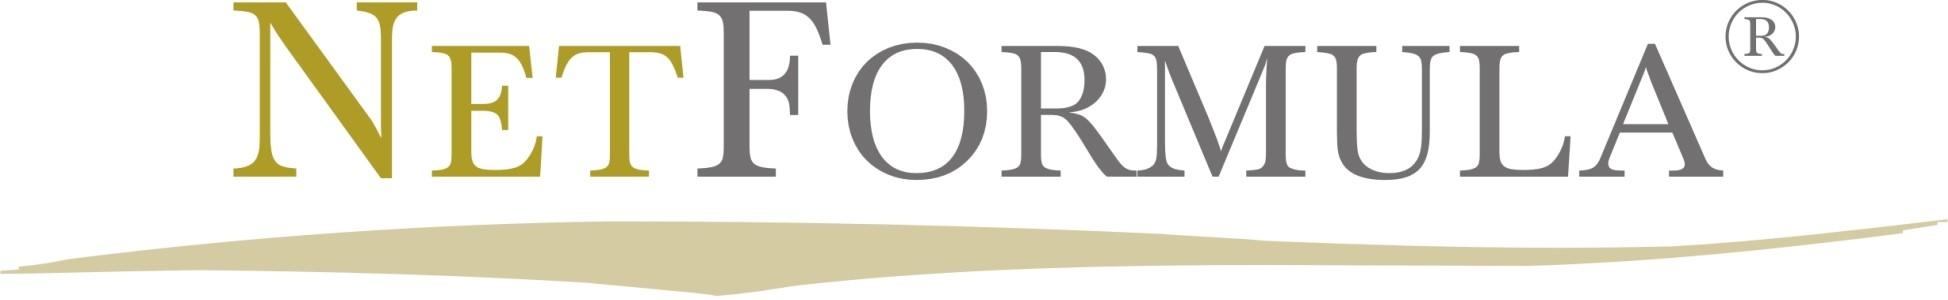 NetFormula GmbH